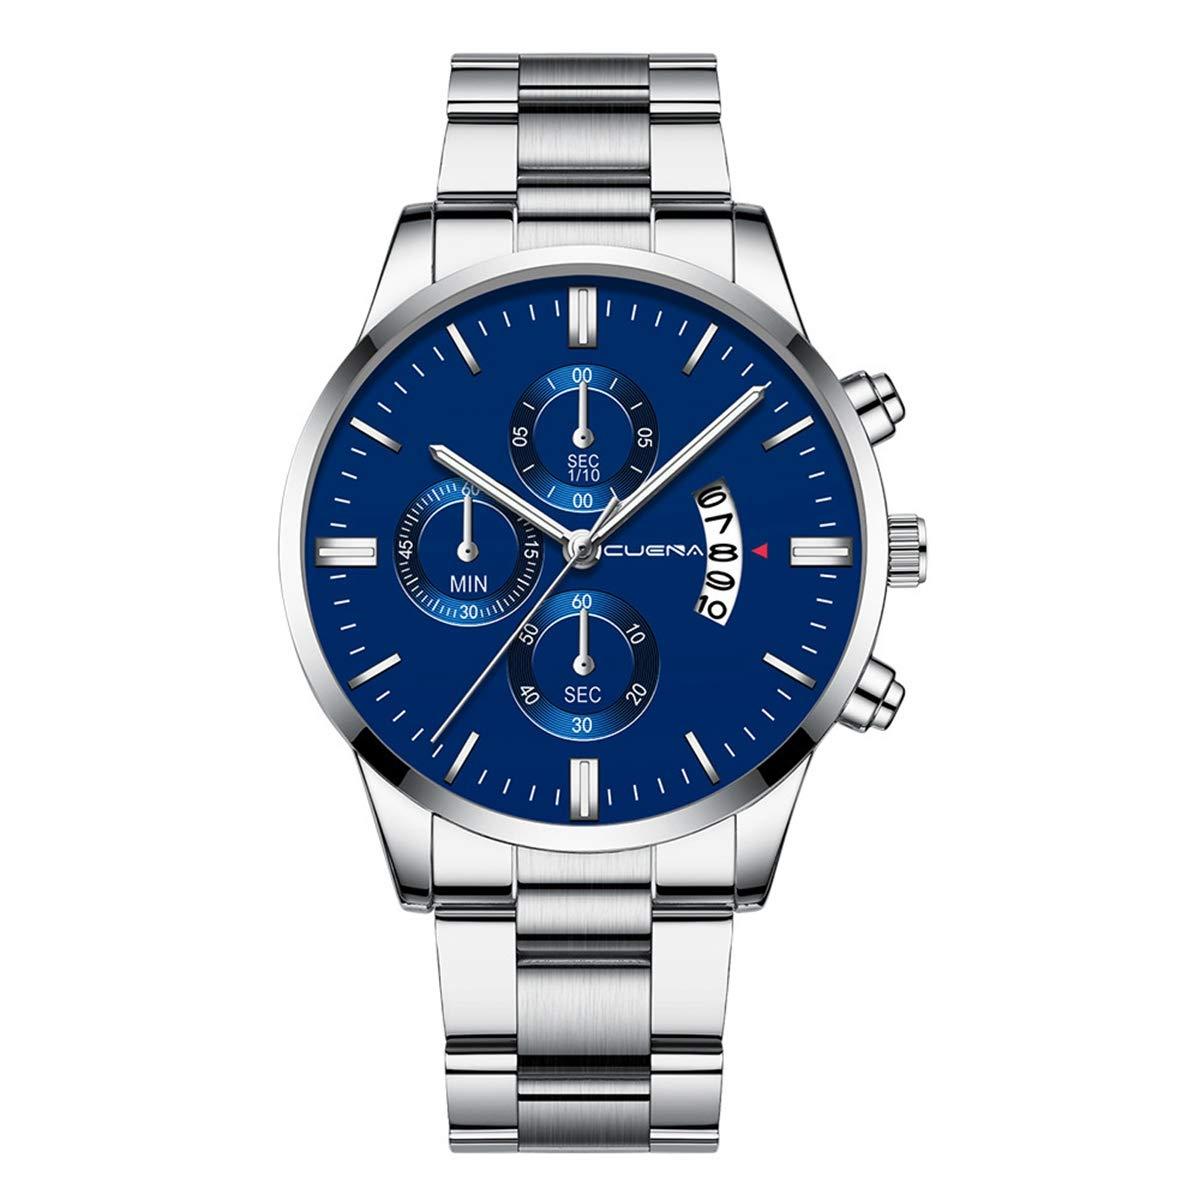 ZODRQ Men's Watch,Fashion Waterproof Sport Watches Stainless Steel Wrist Watch Wristwatch Date Quartz Watch for Men Gift (M) by ZODRQ